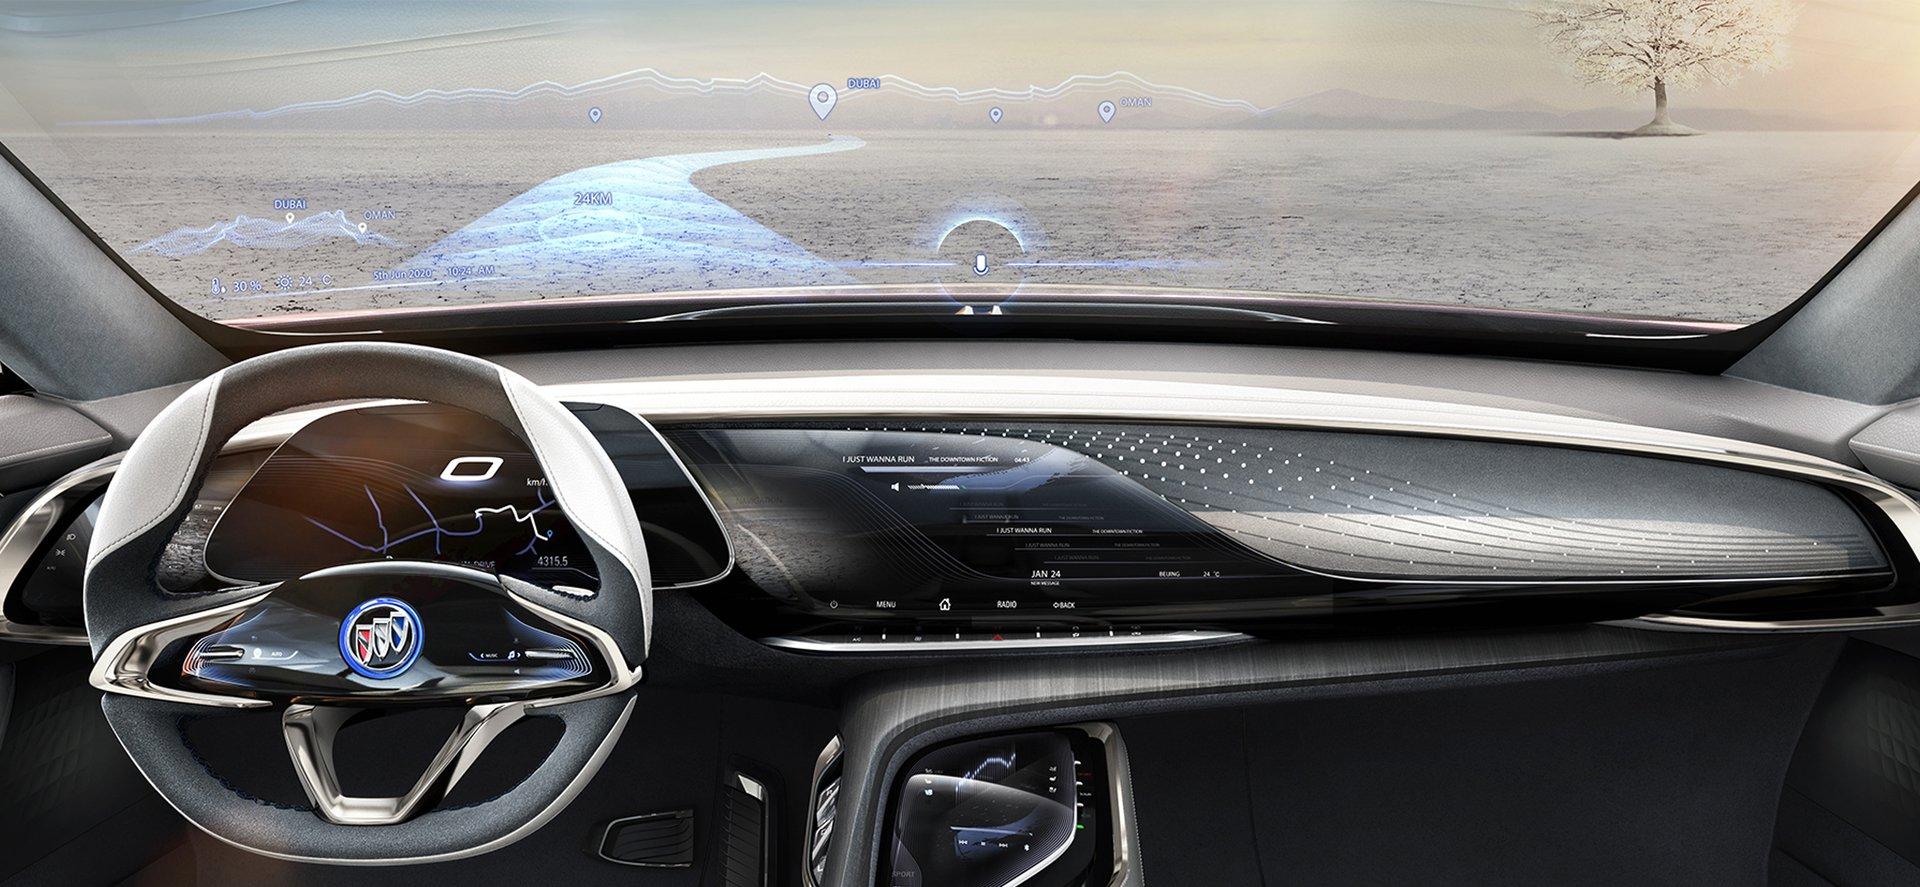 LCD car windscreen